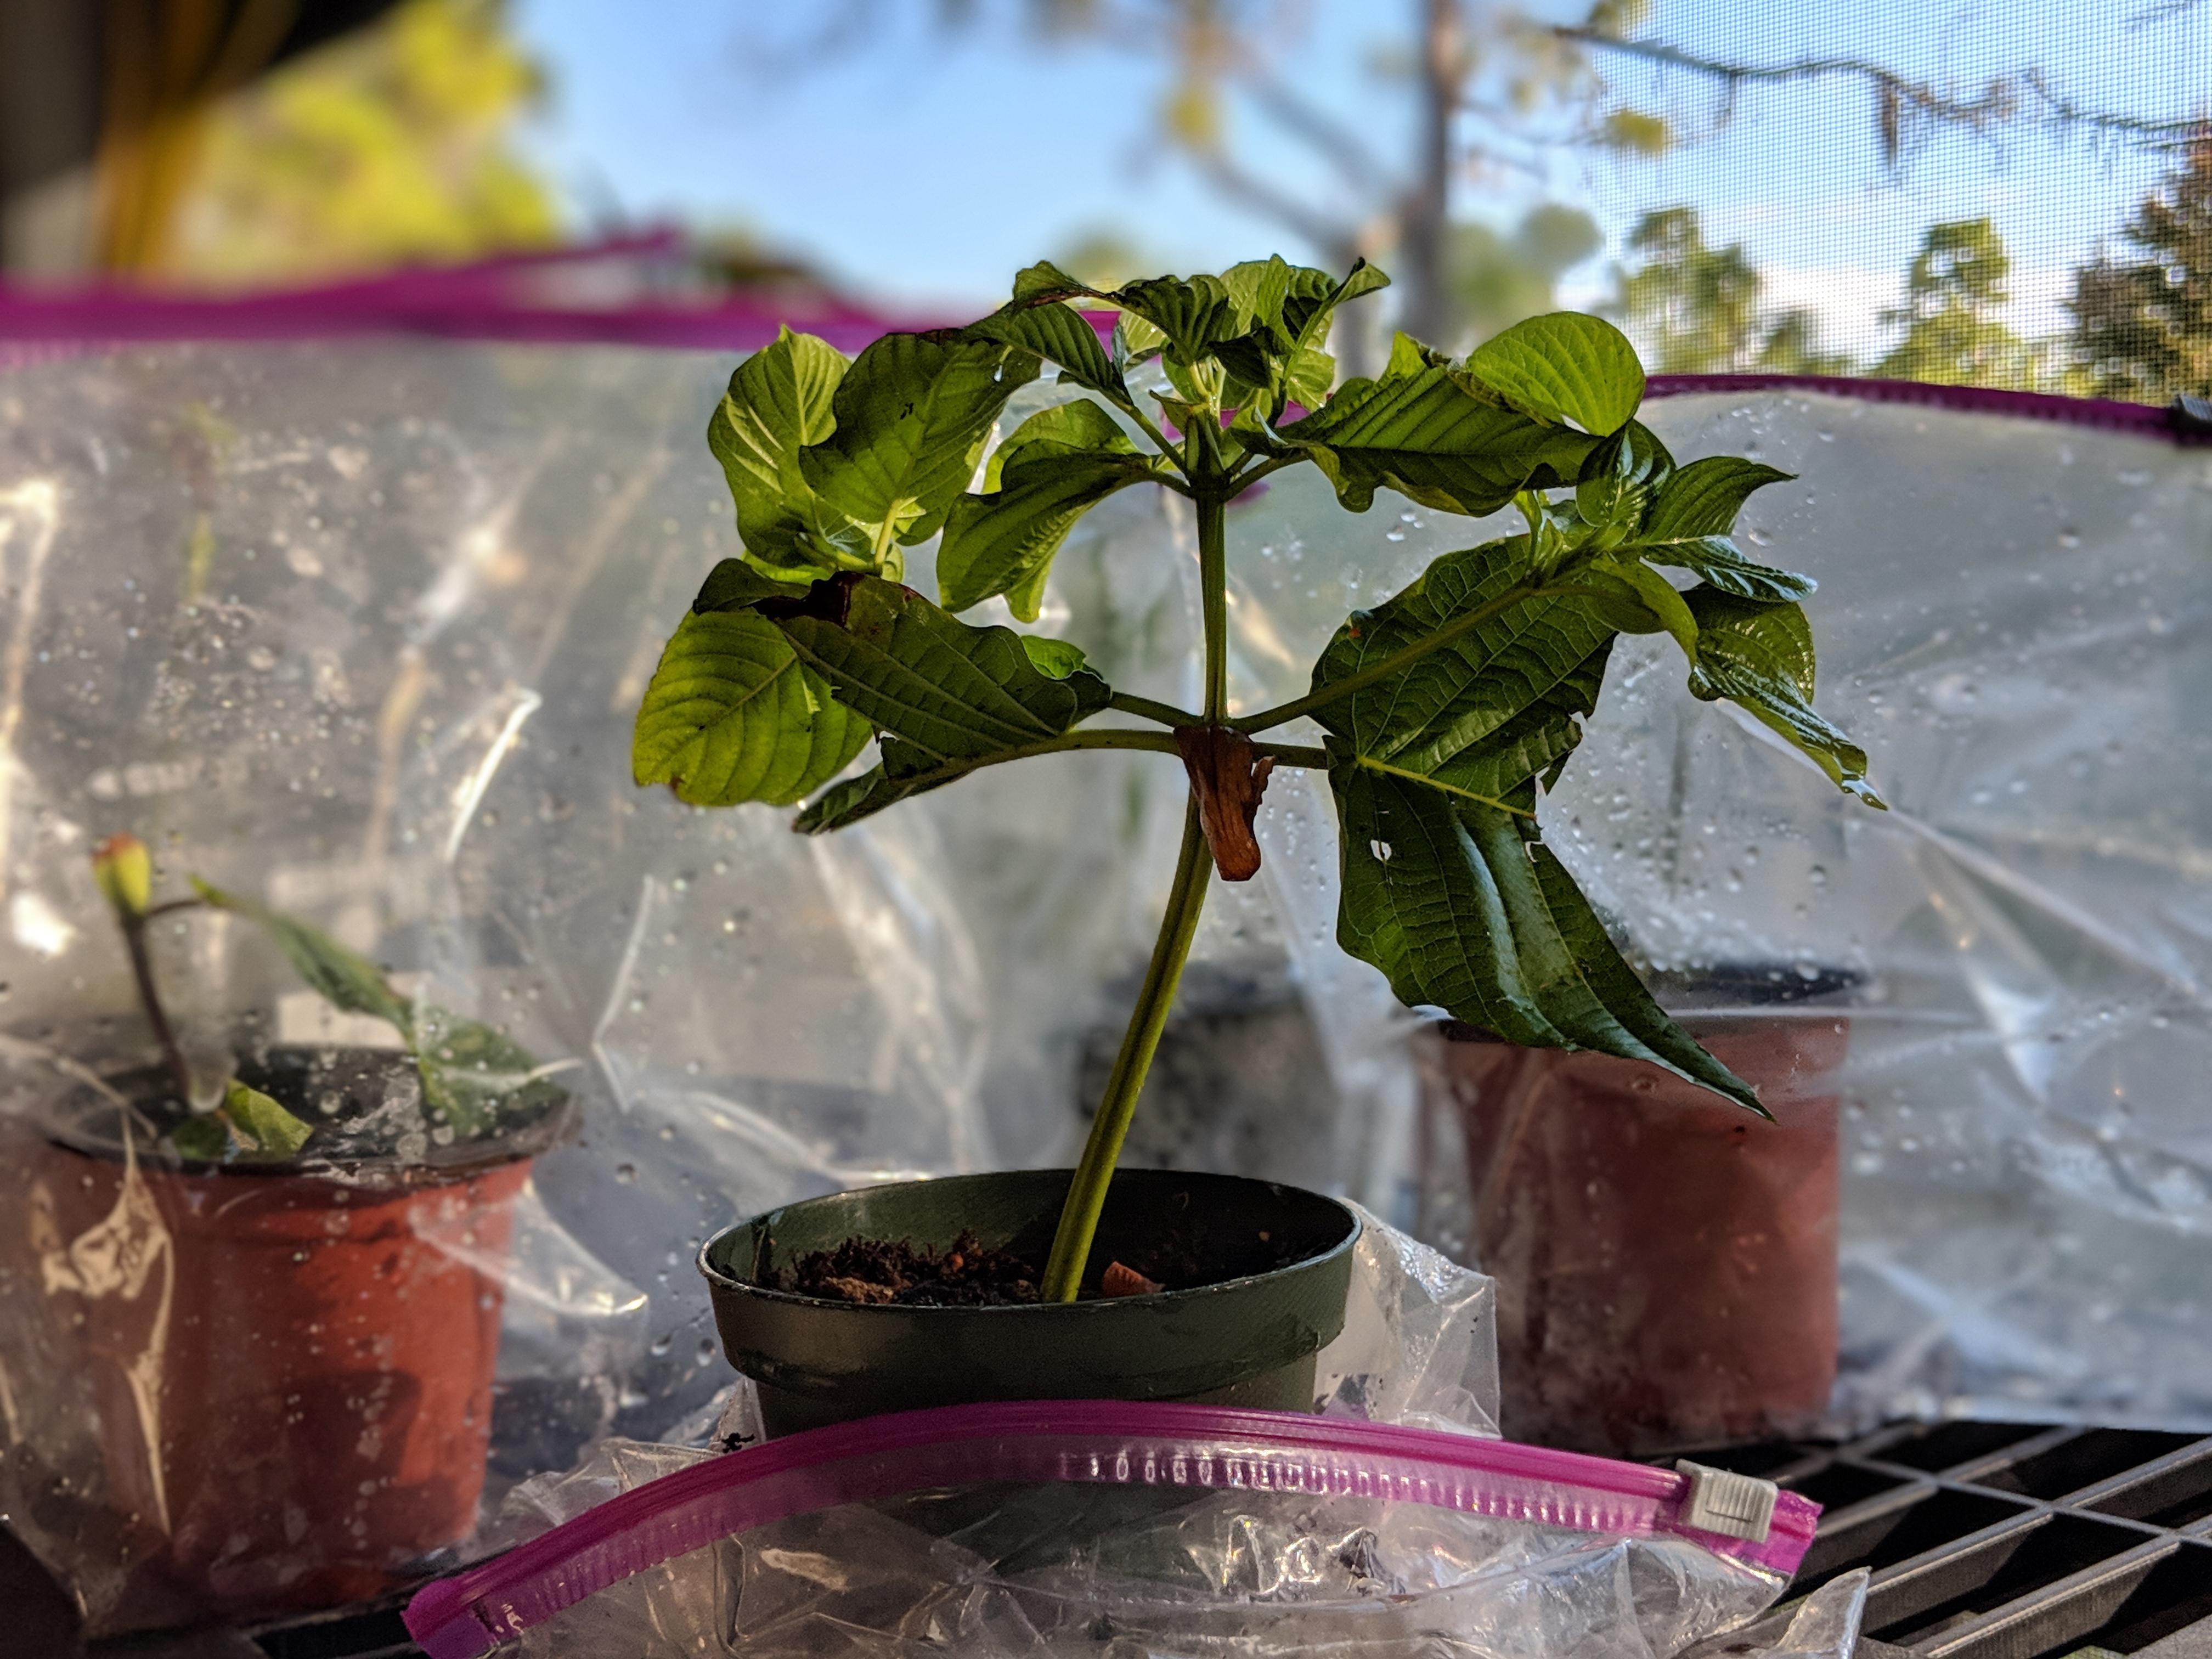 Buy Maeng Da Thai Kratom cuttings